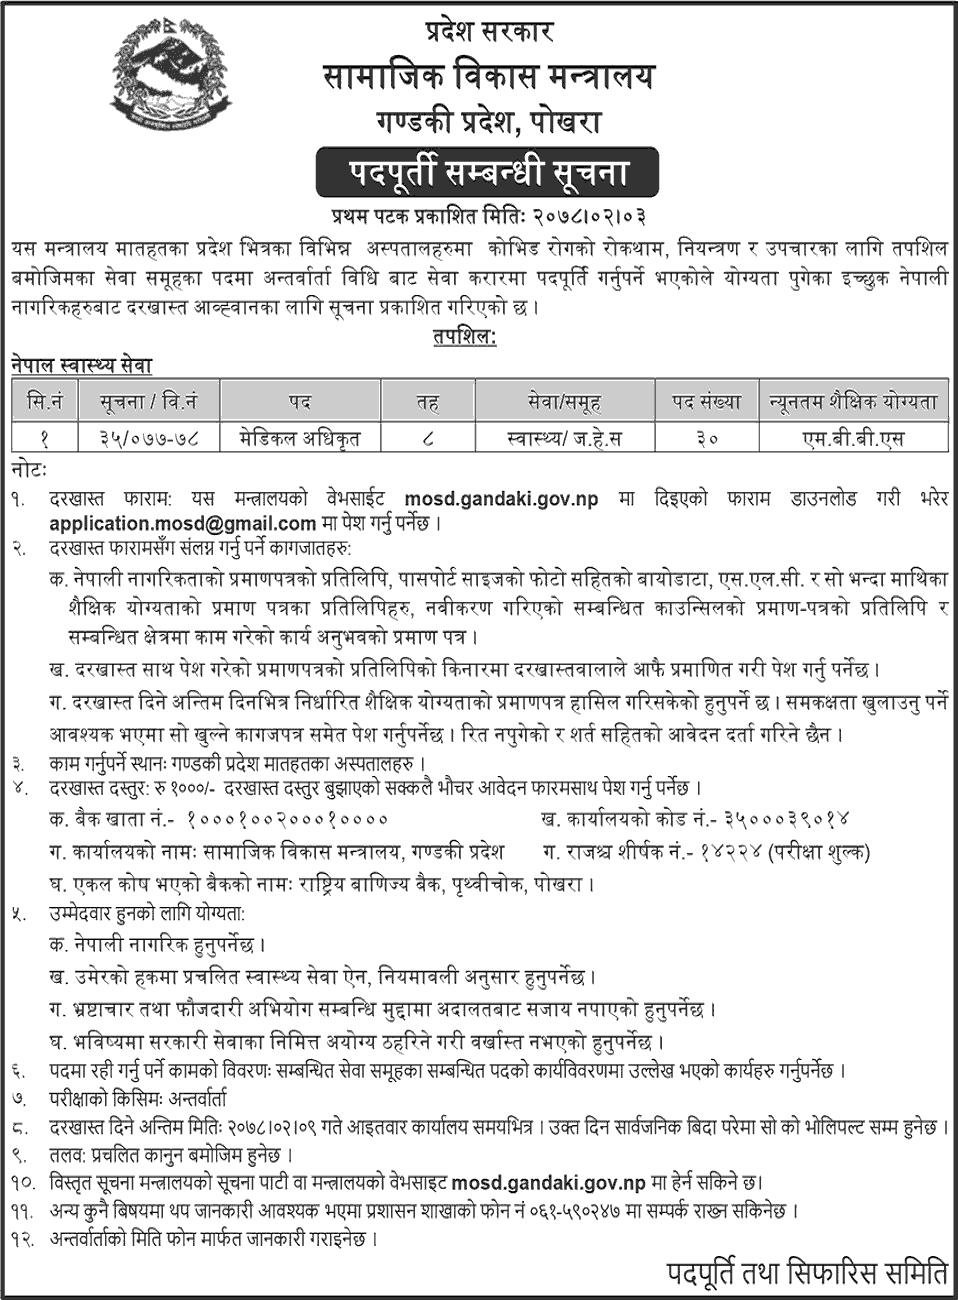 Gandaki Pradesh - Ministry of Social Development Job Vacancy for Medical Officer